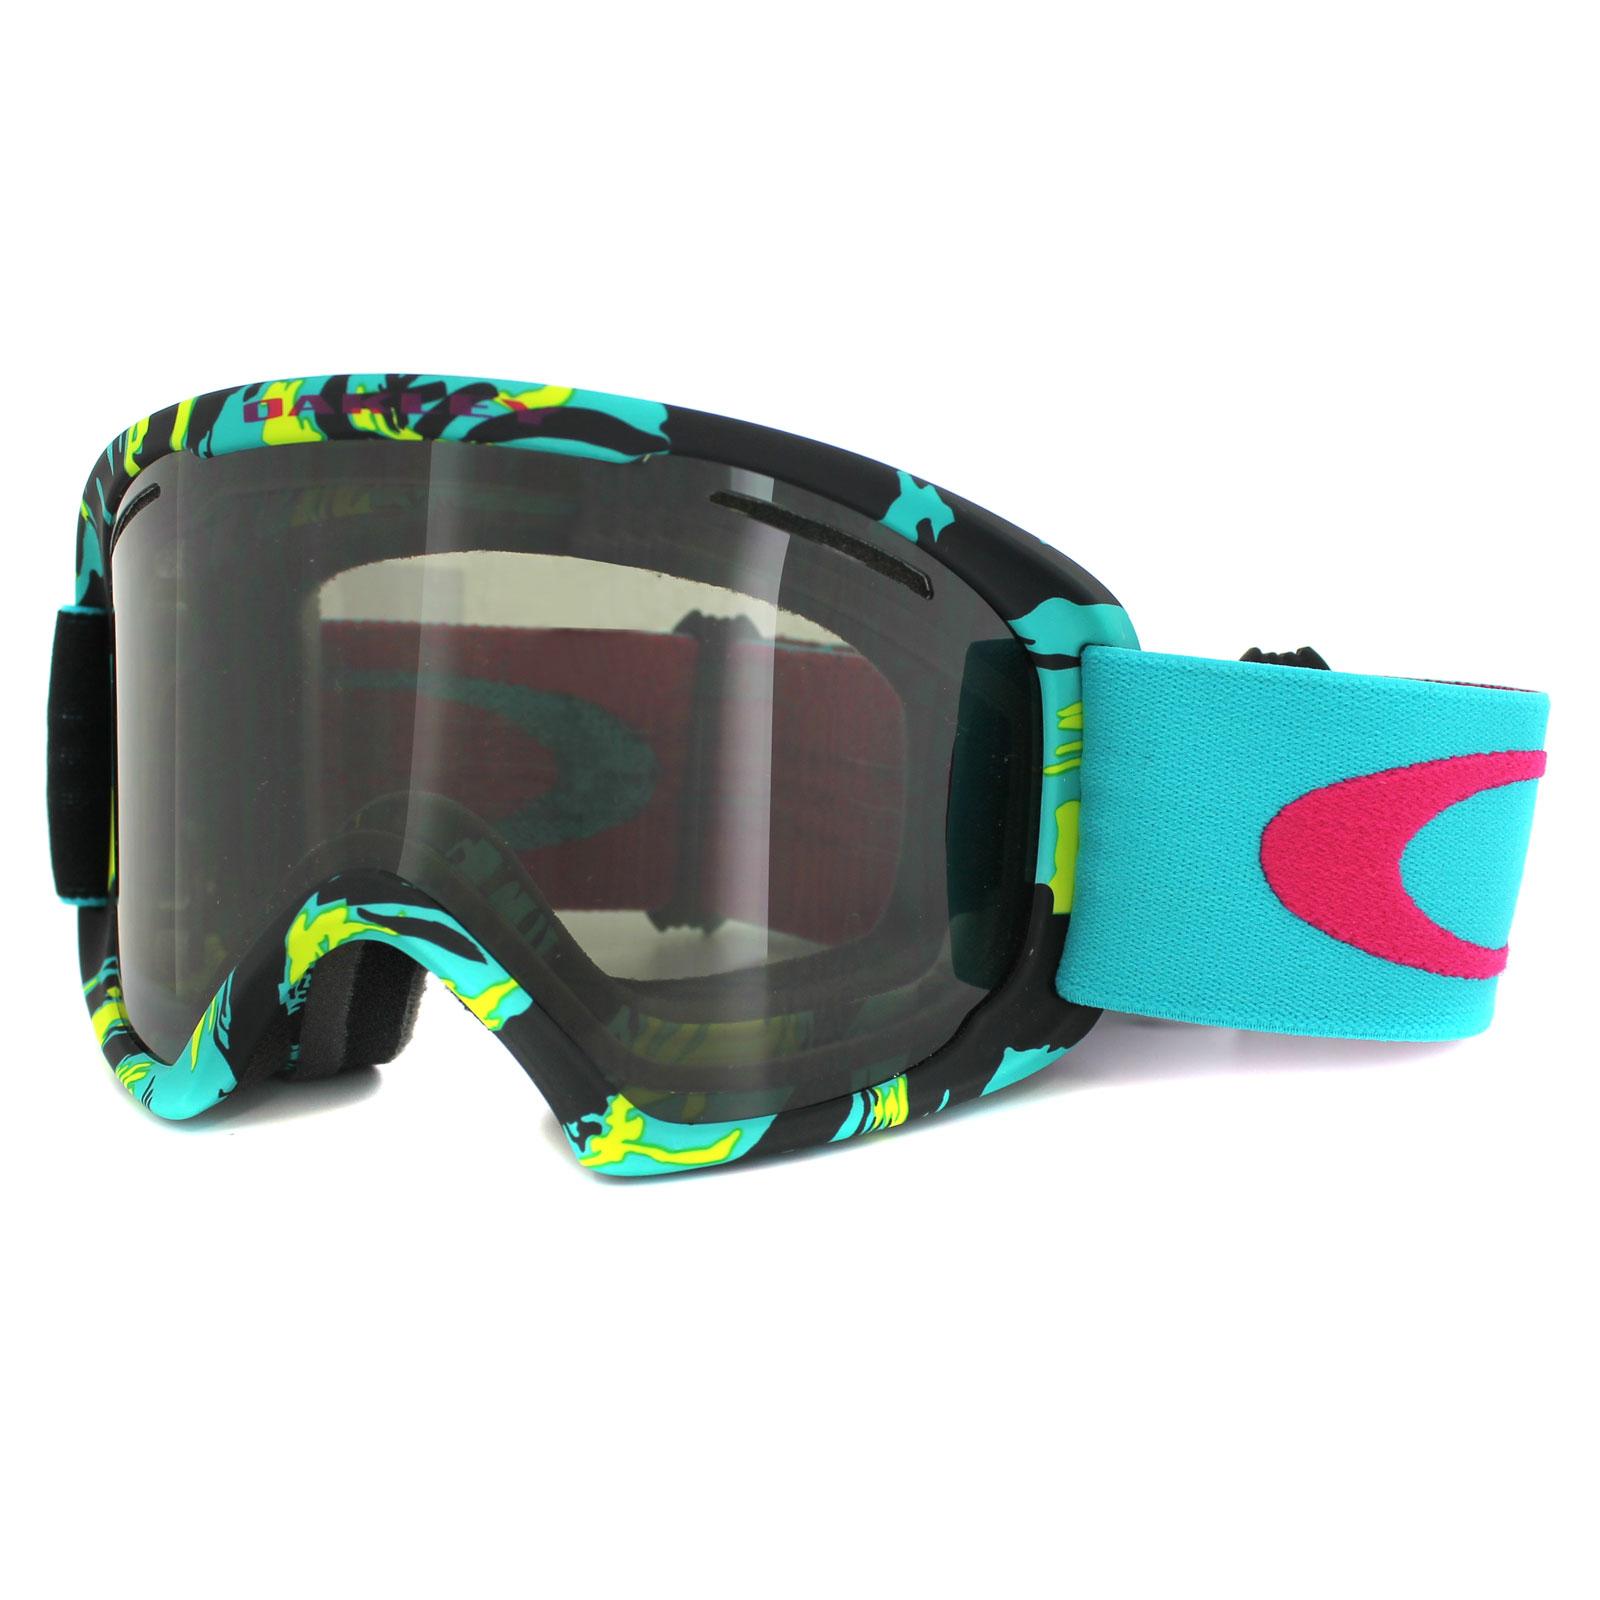 oakley danny kass goggles